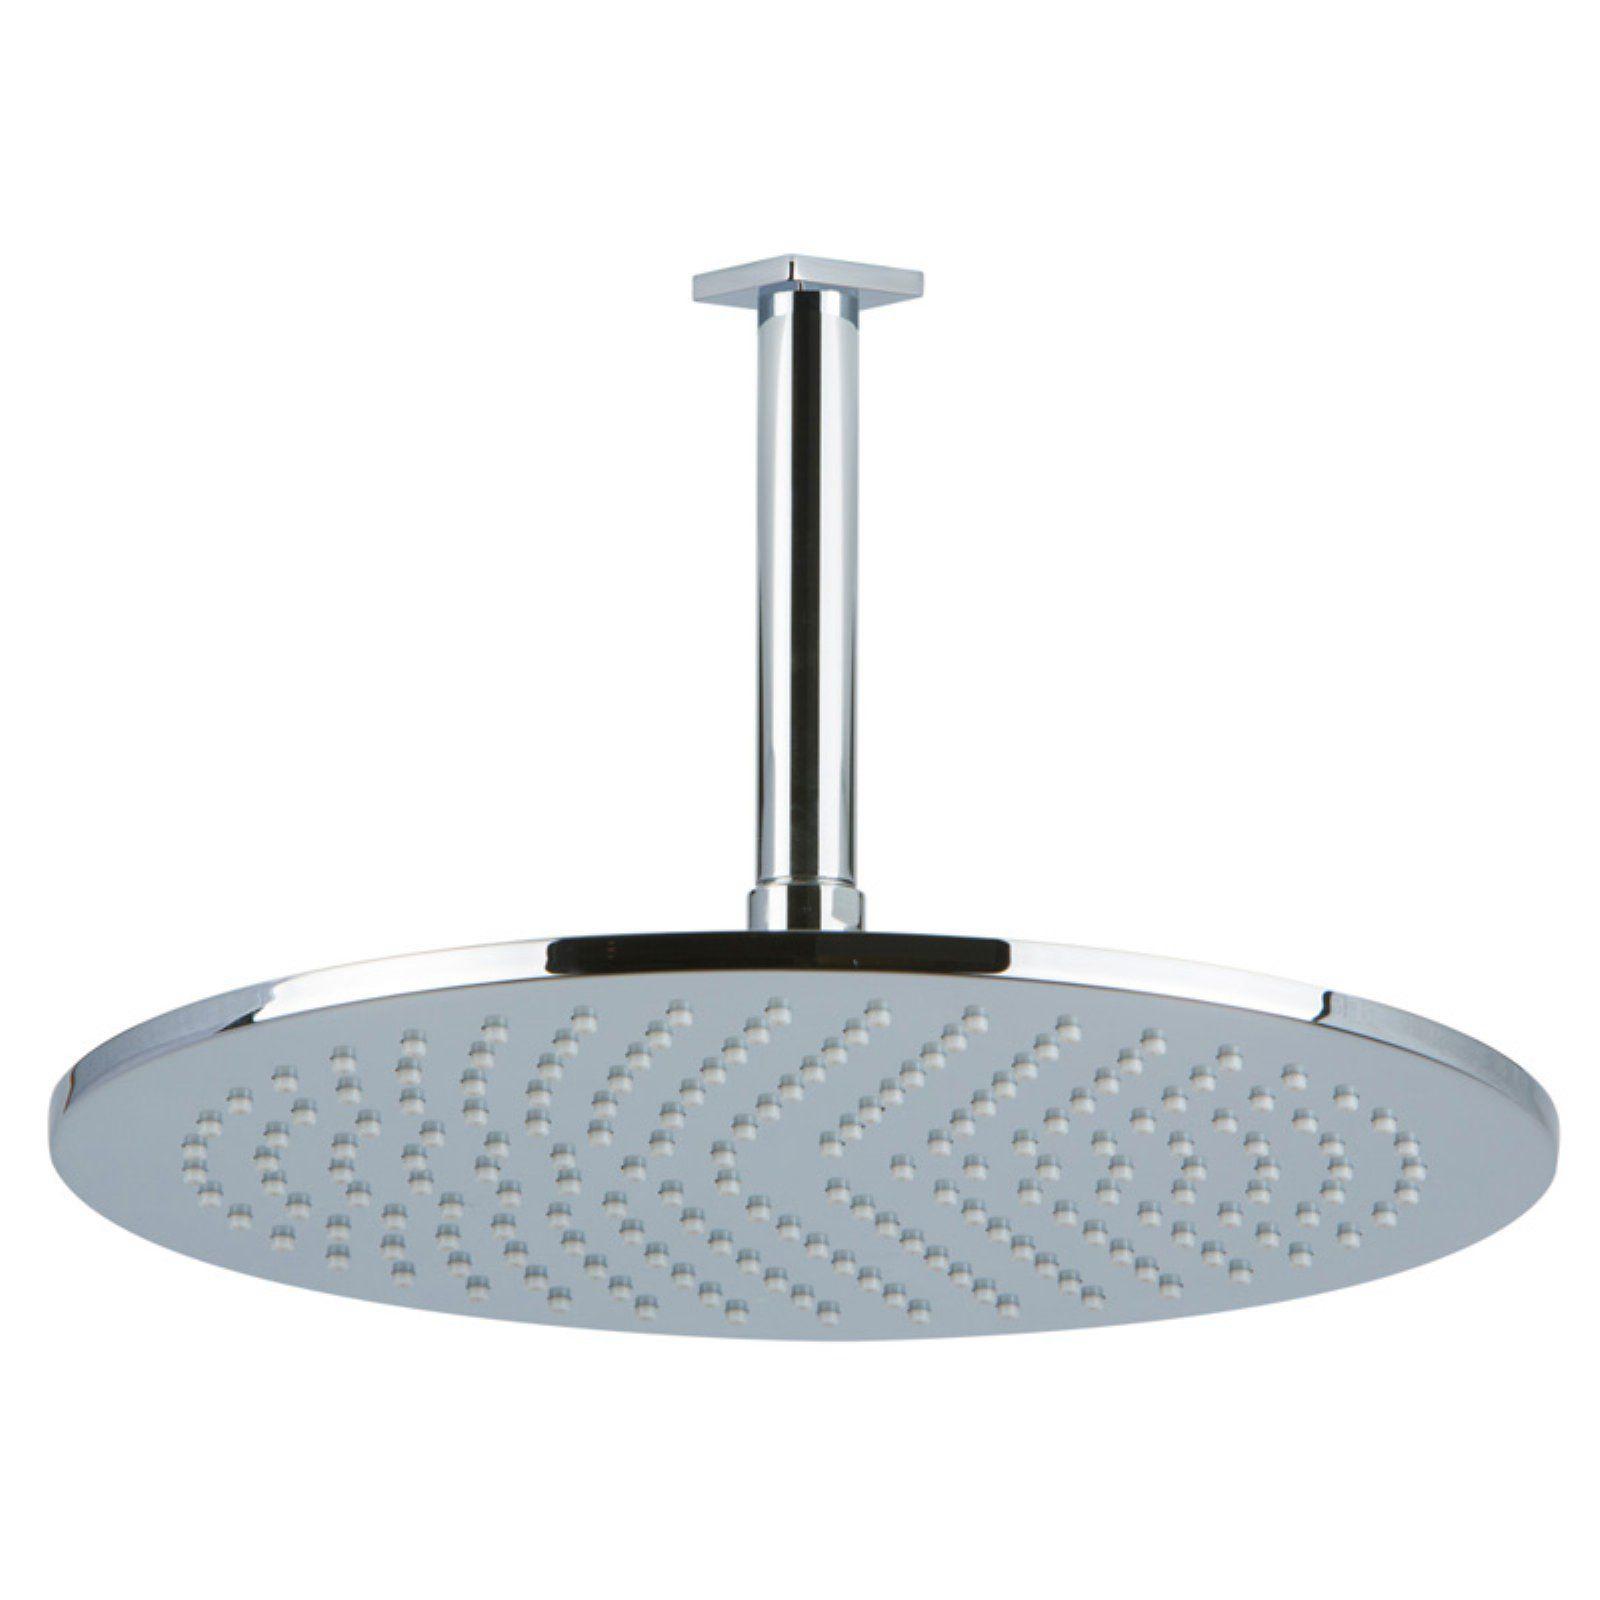 Borhn B52878 Ceiling Mount Shower Rainhead Shower Heads Shower